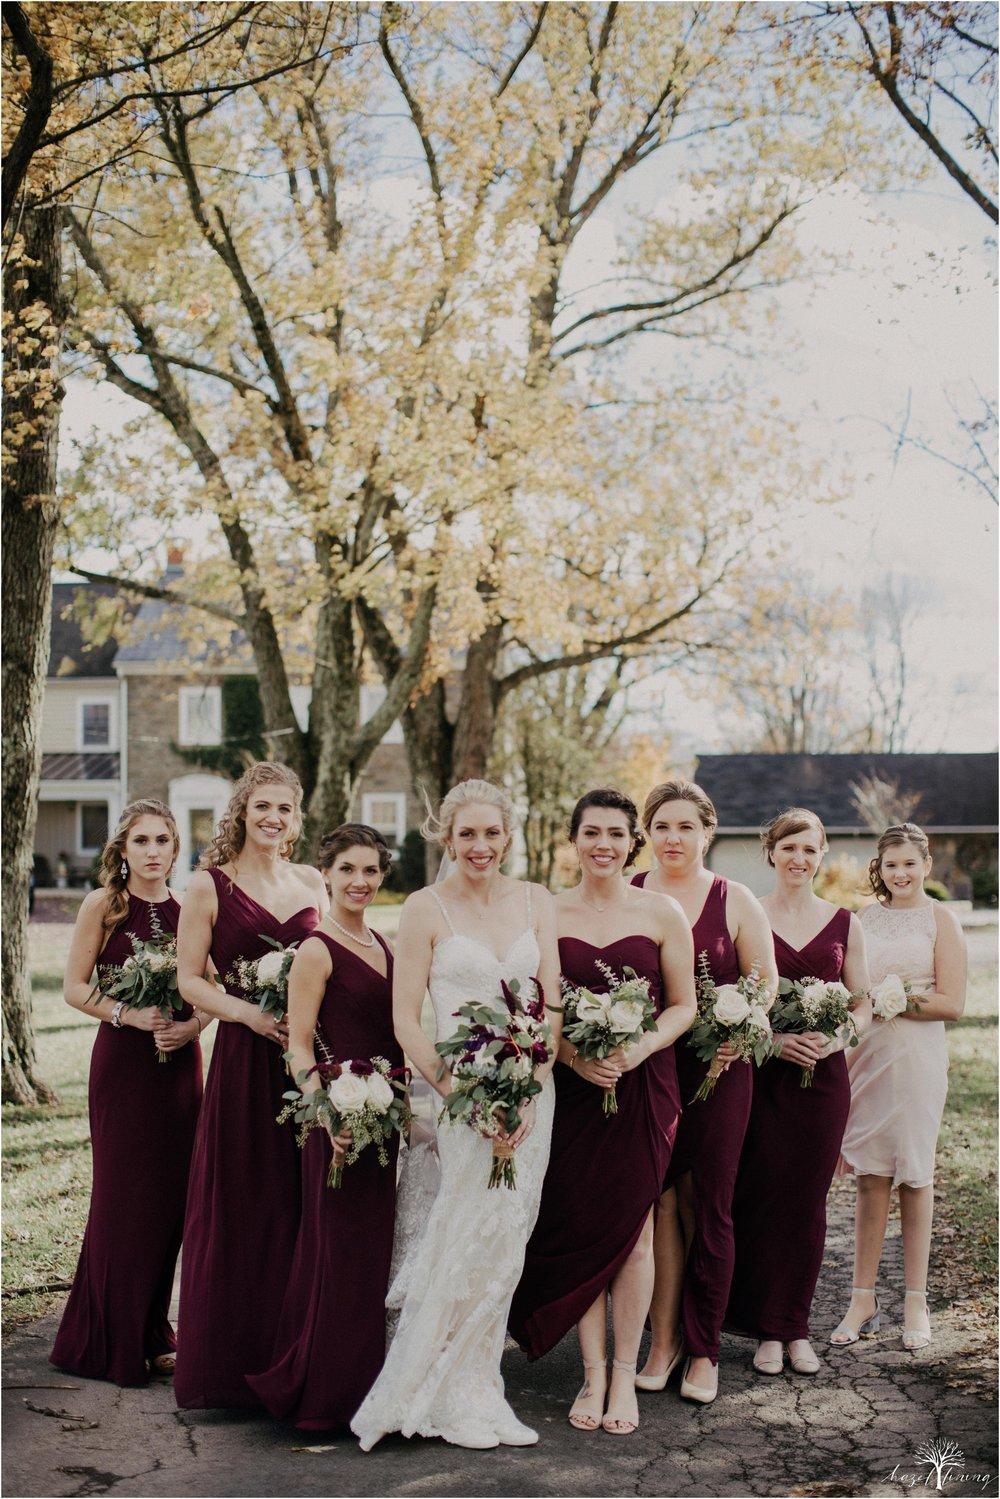 briana-krans-greg-johnston-farm-bakery-and-events-fall-wedding_0046.jpg